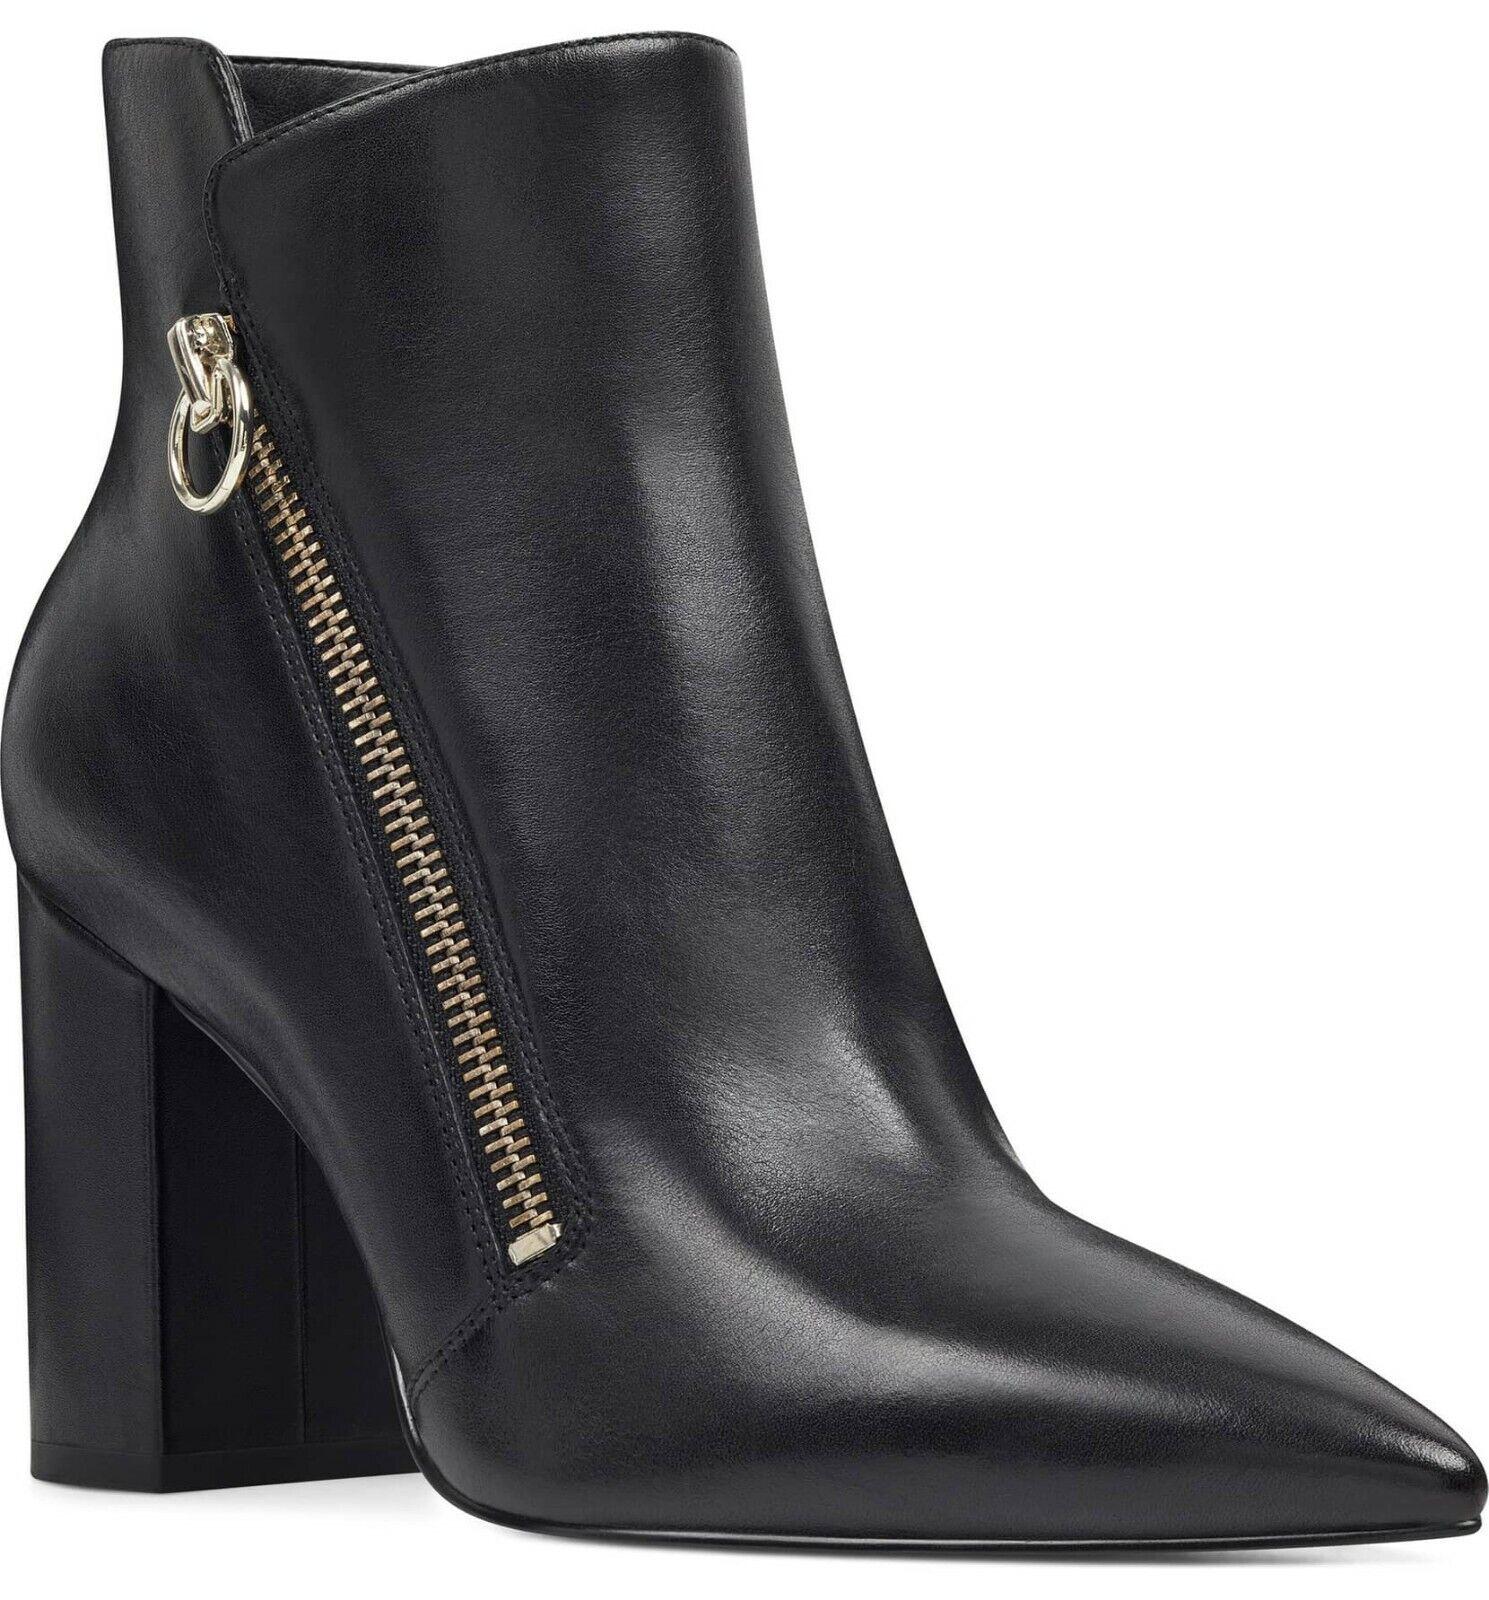 Nine West Rusity Sexy Zipper nero  Leather Chunky Heel Dress avvioie 12M   presa